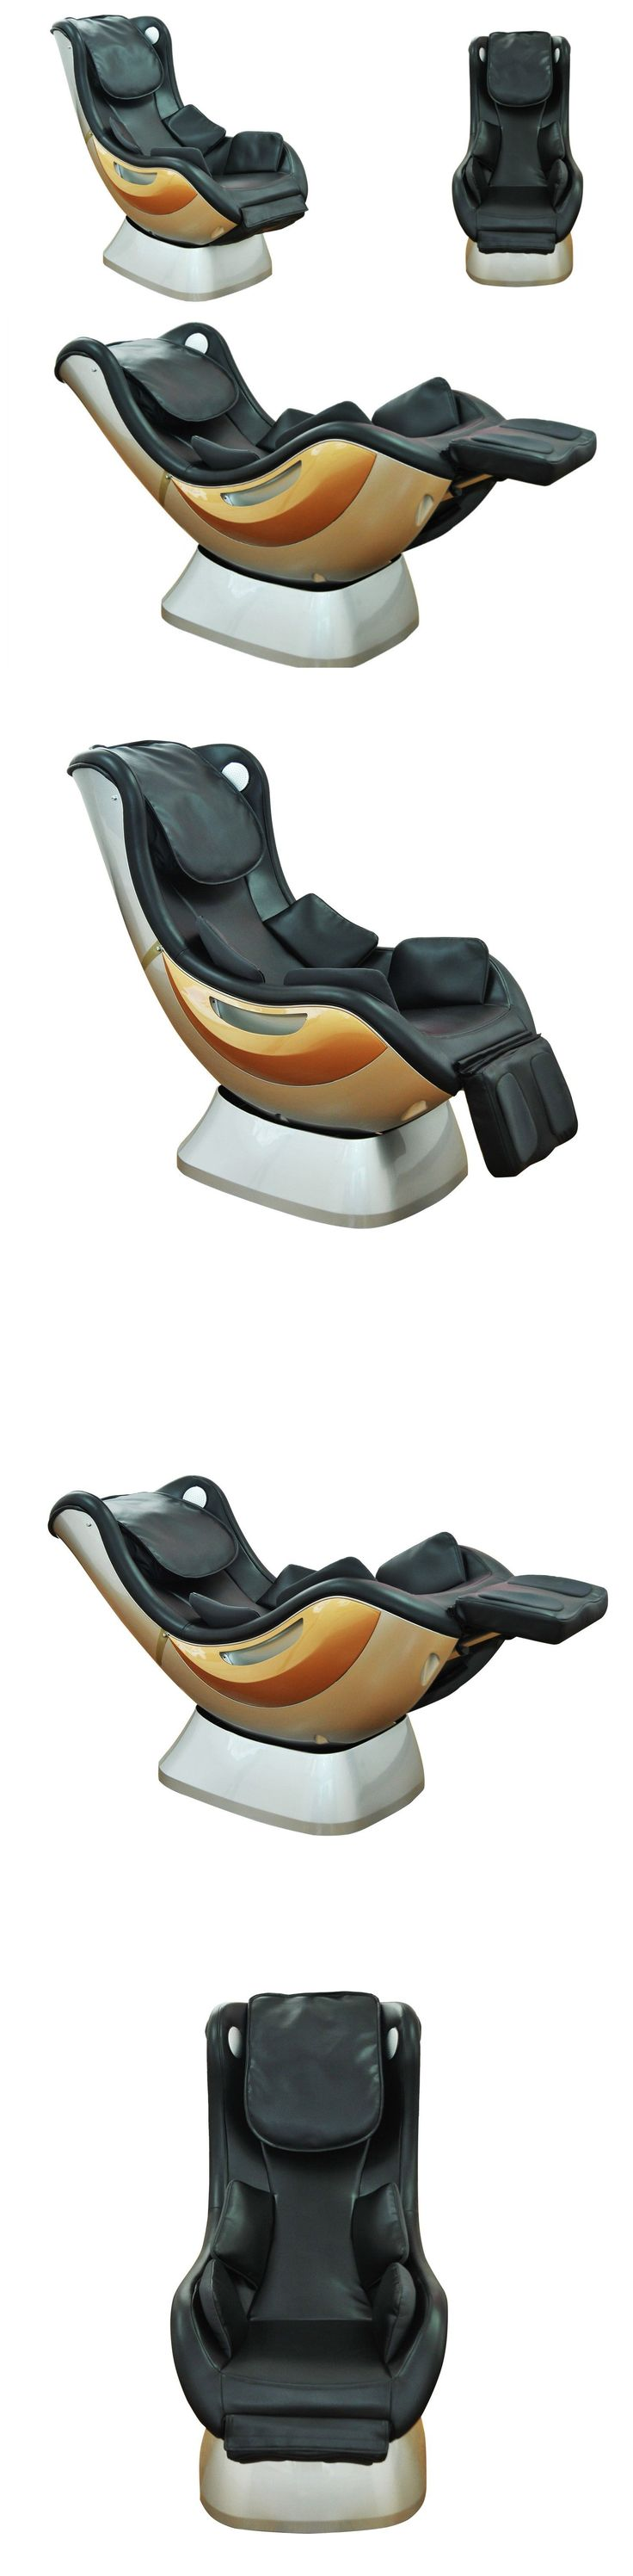 17 Best ideas about Massage Chair on Pinterest